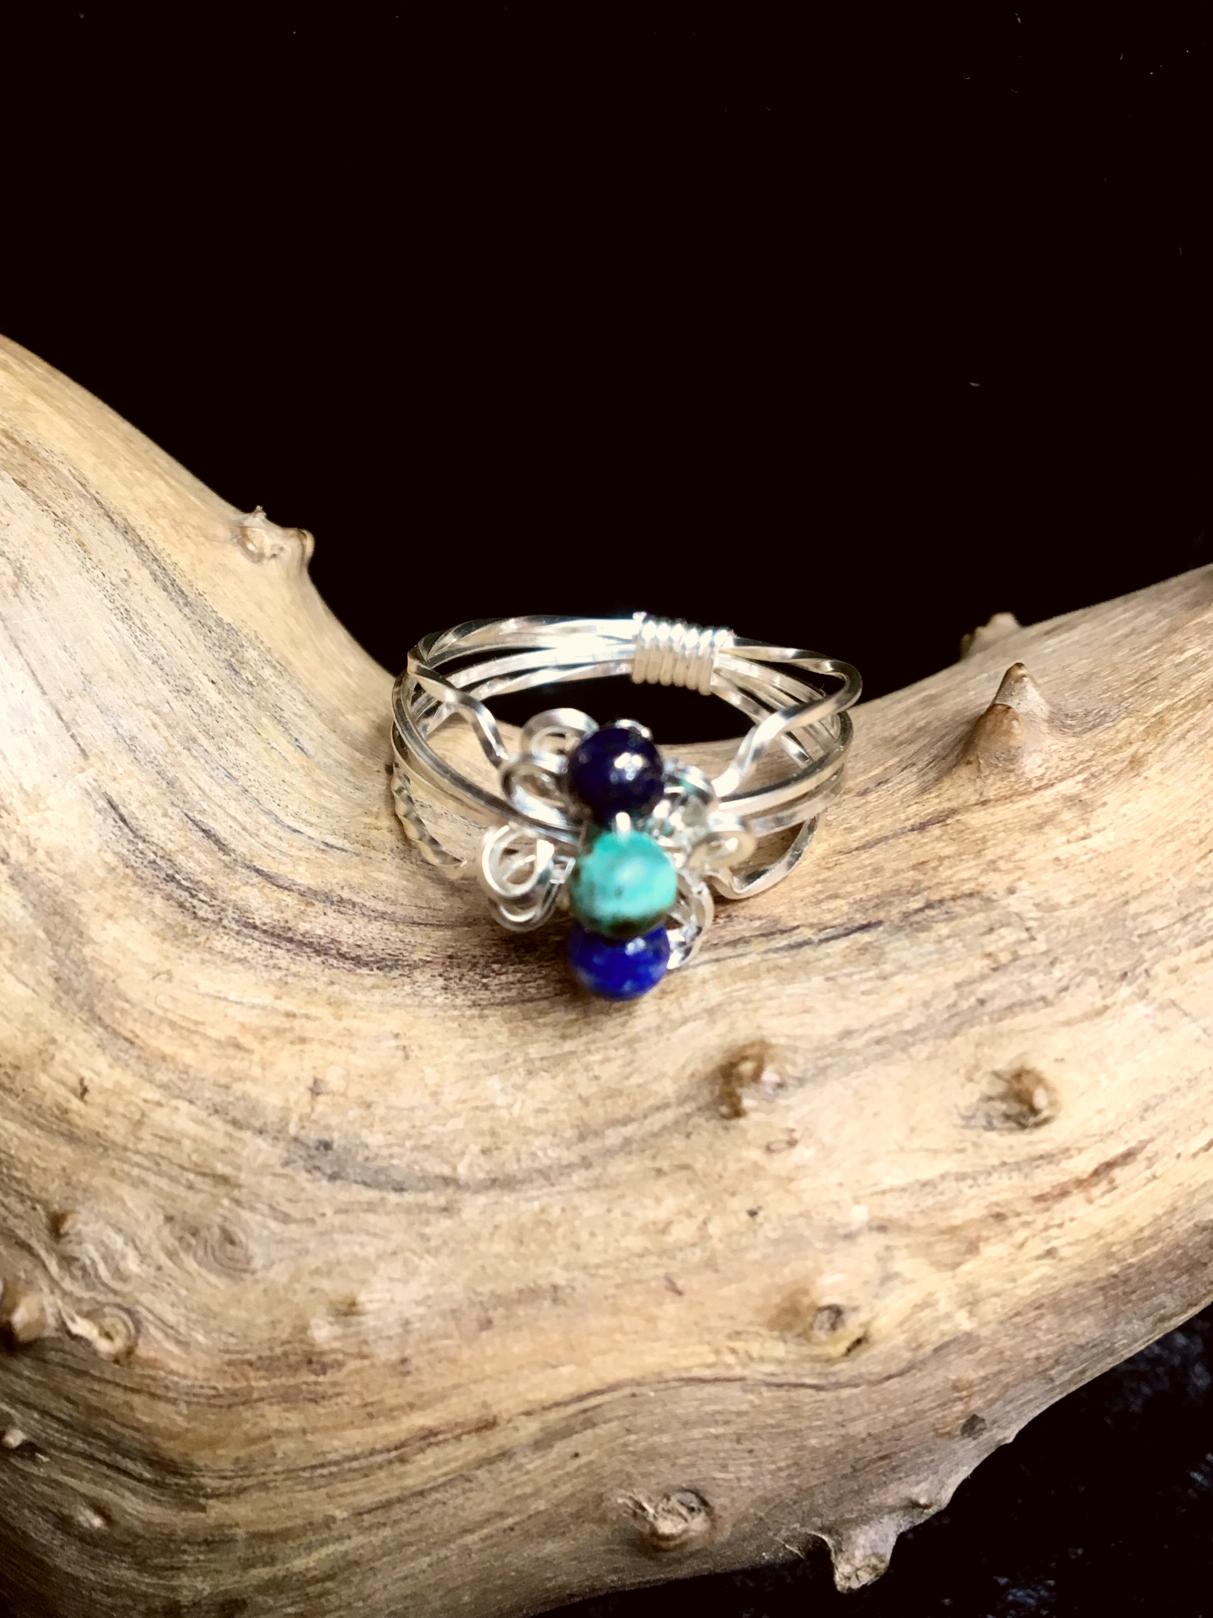 Qhresnna Quartz Ring - Lapis Lazuli and Turquoise - Silver Plated